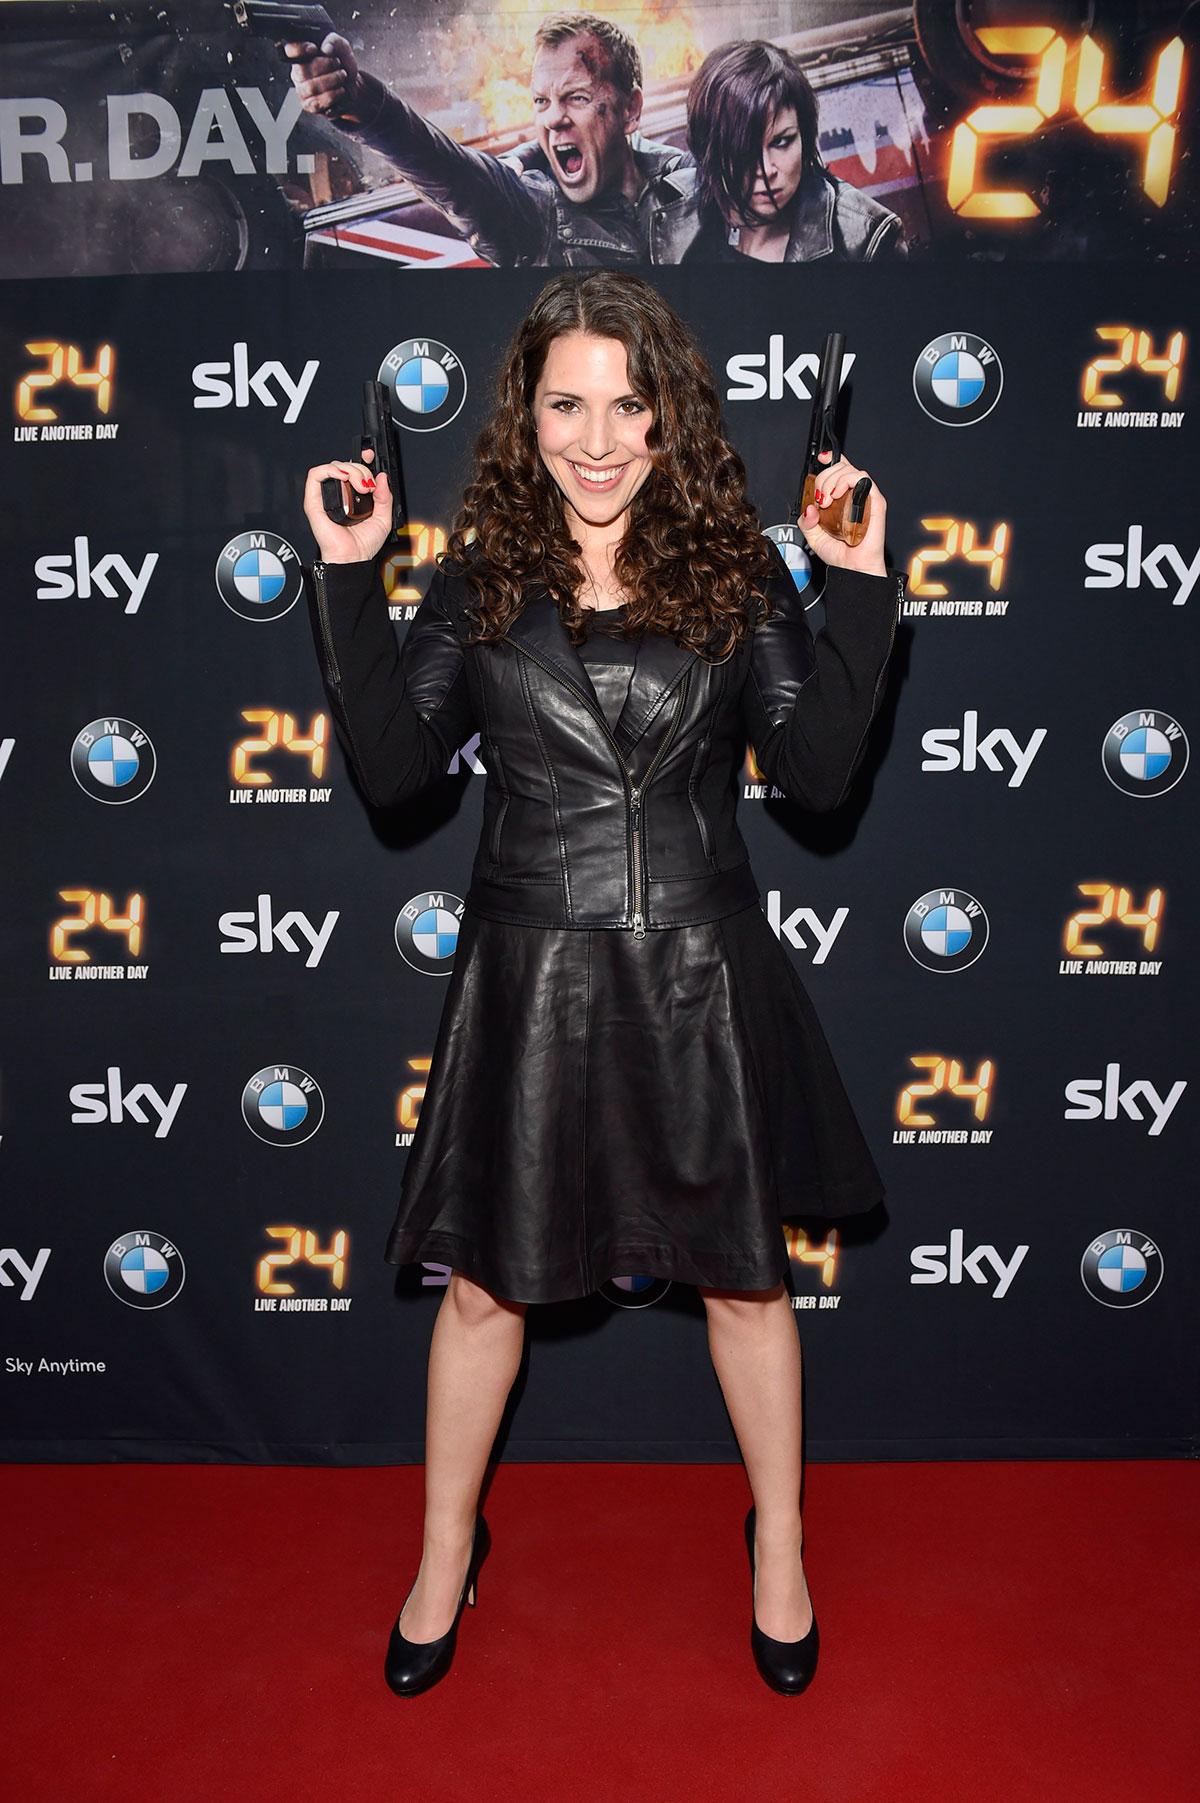 Eva-Maria Reichert attends Live Another Day Premiere